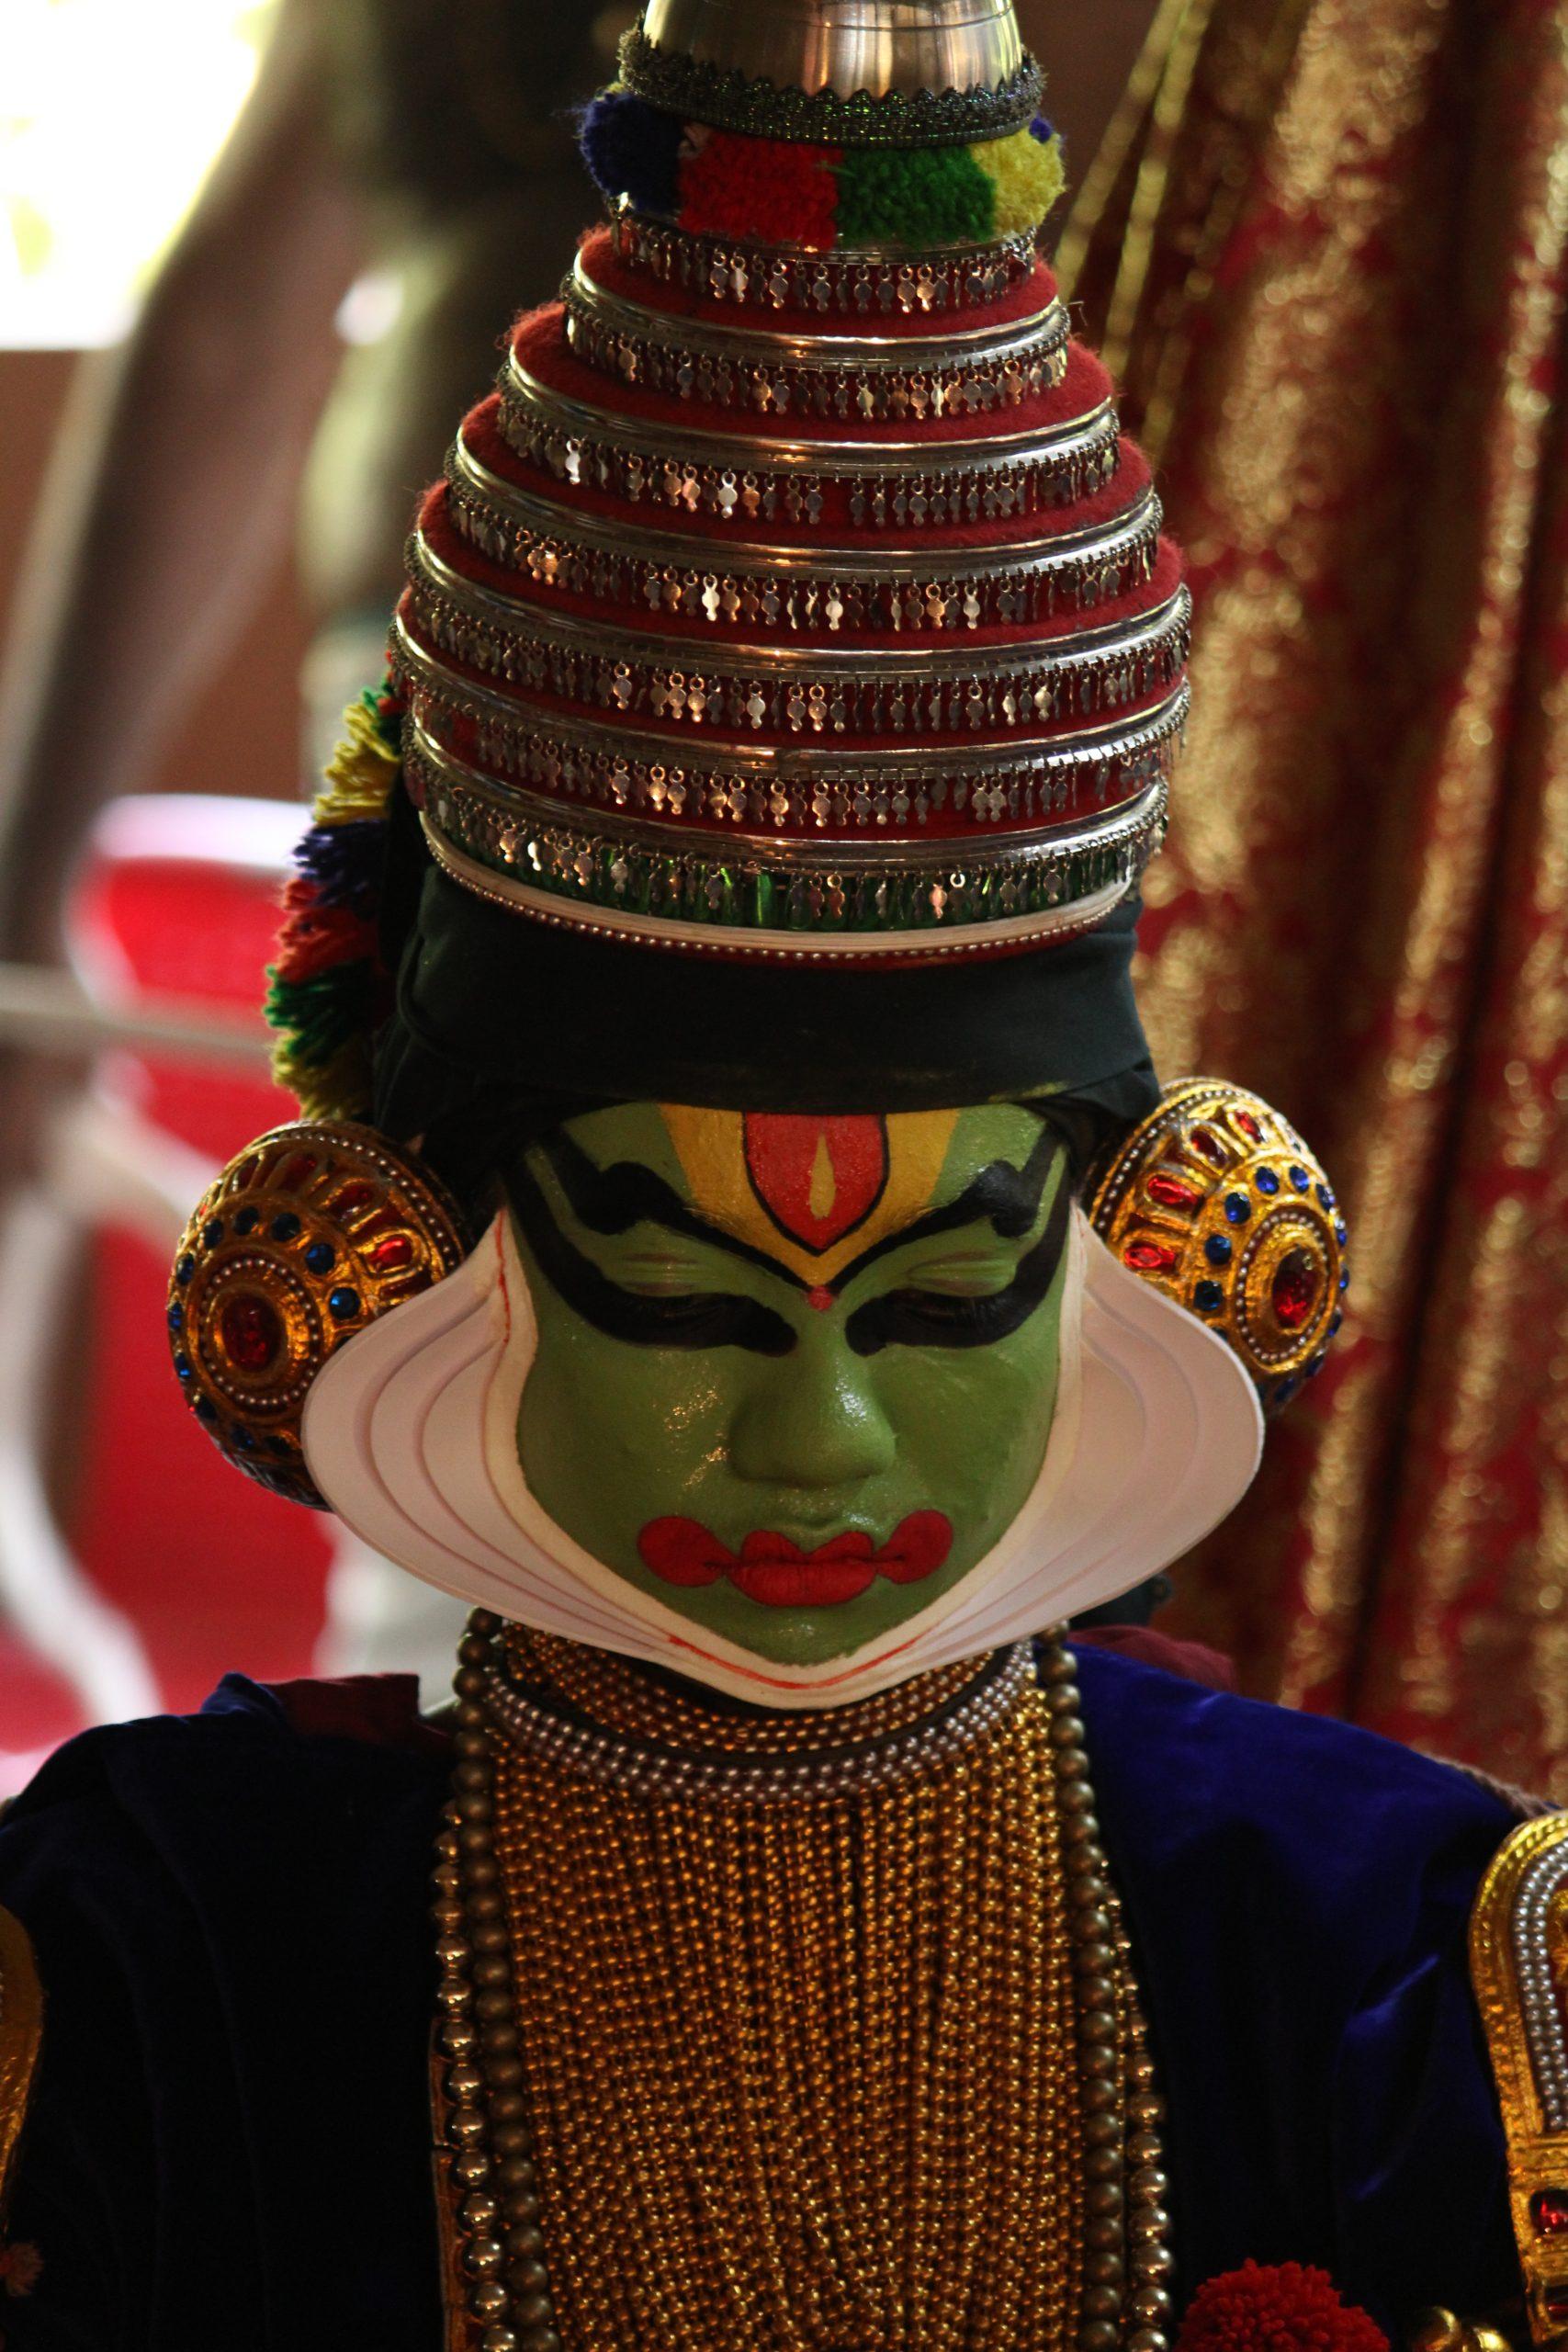 A portrait of a kathakali artist